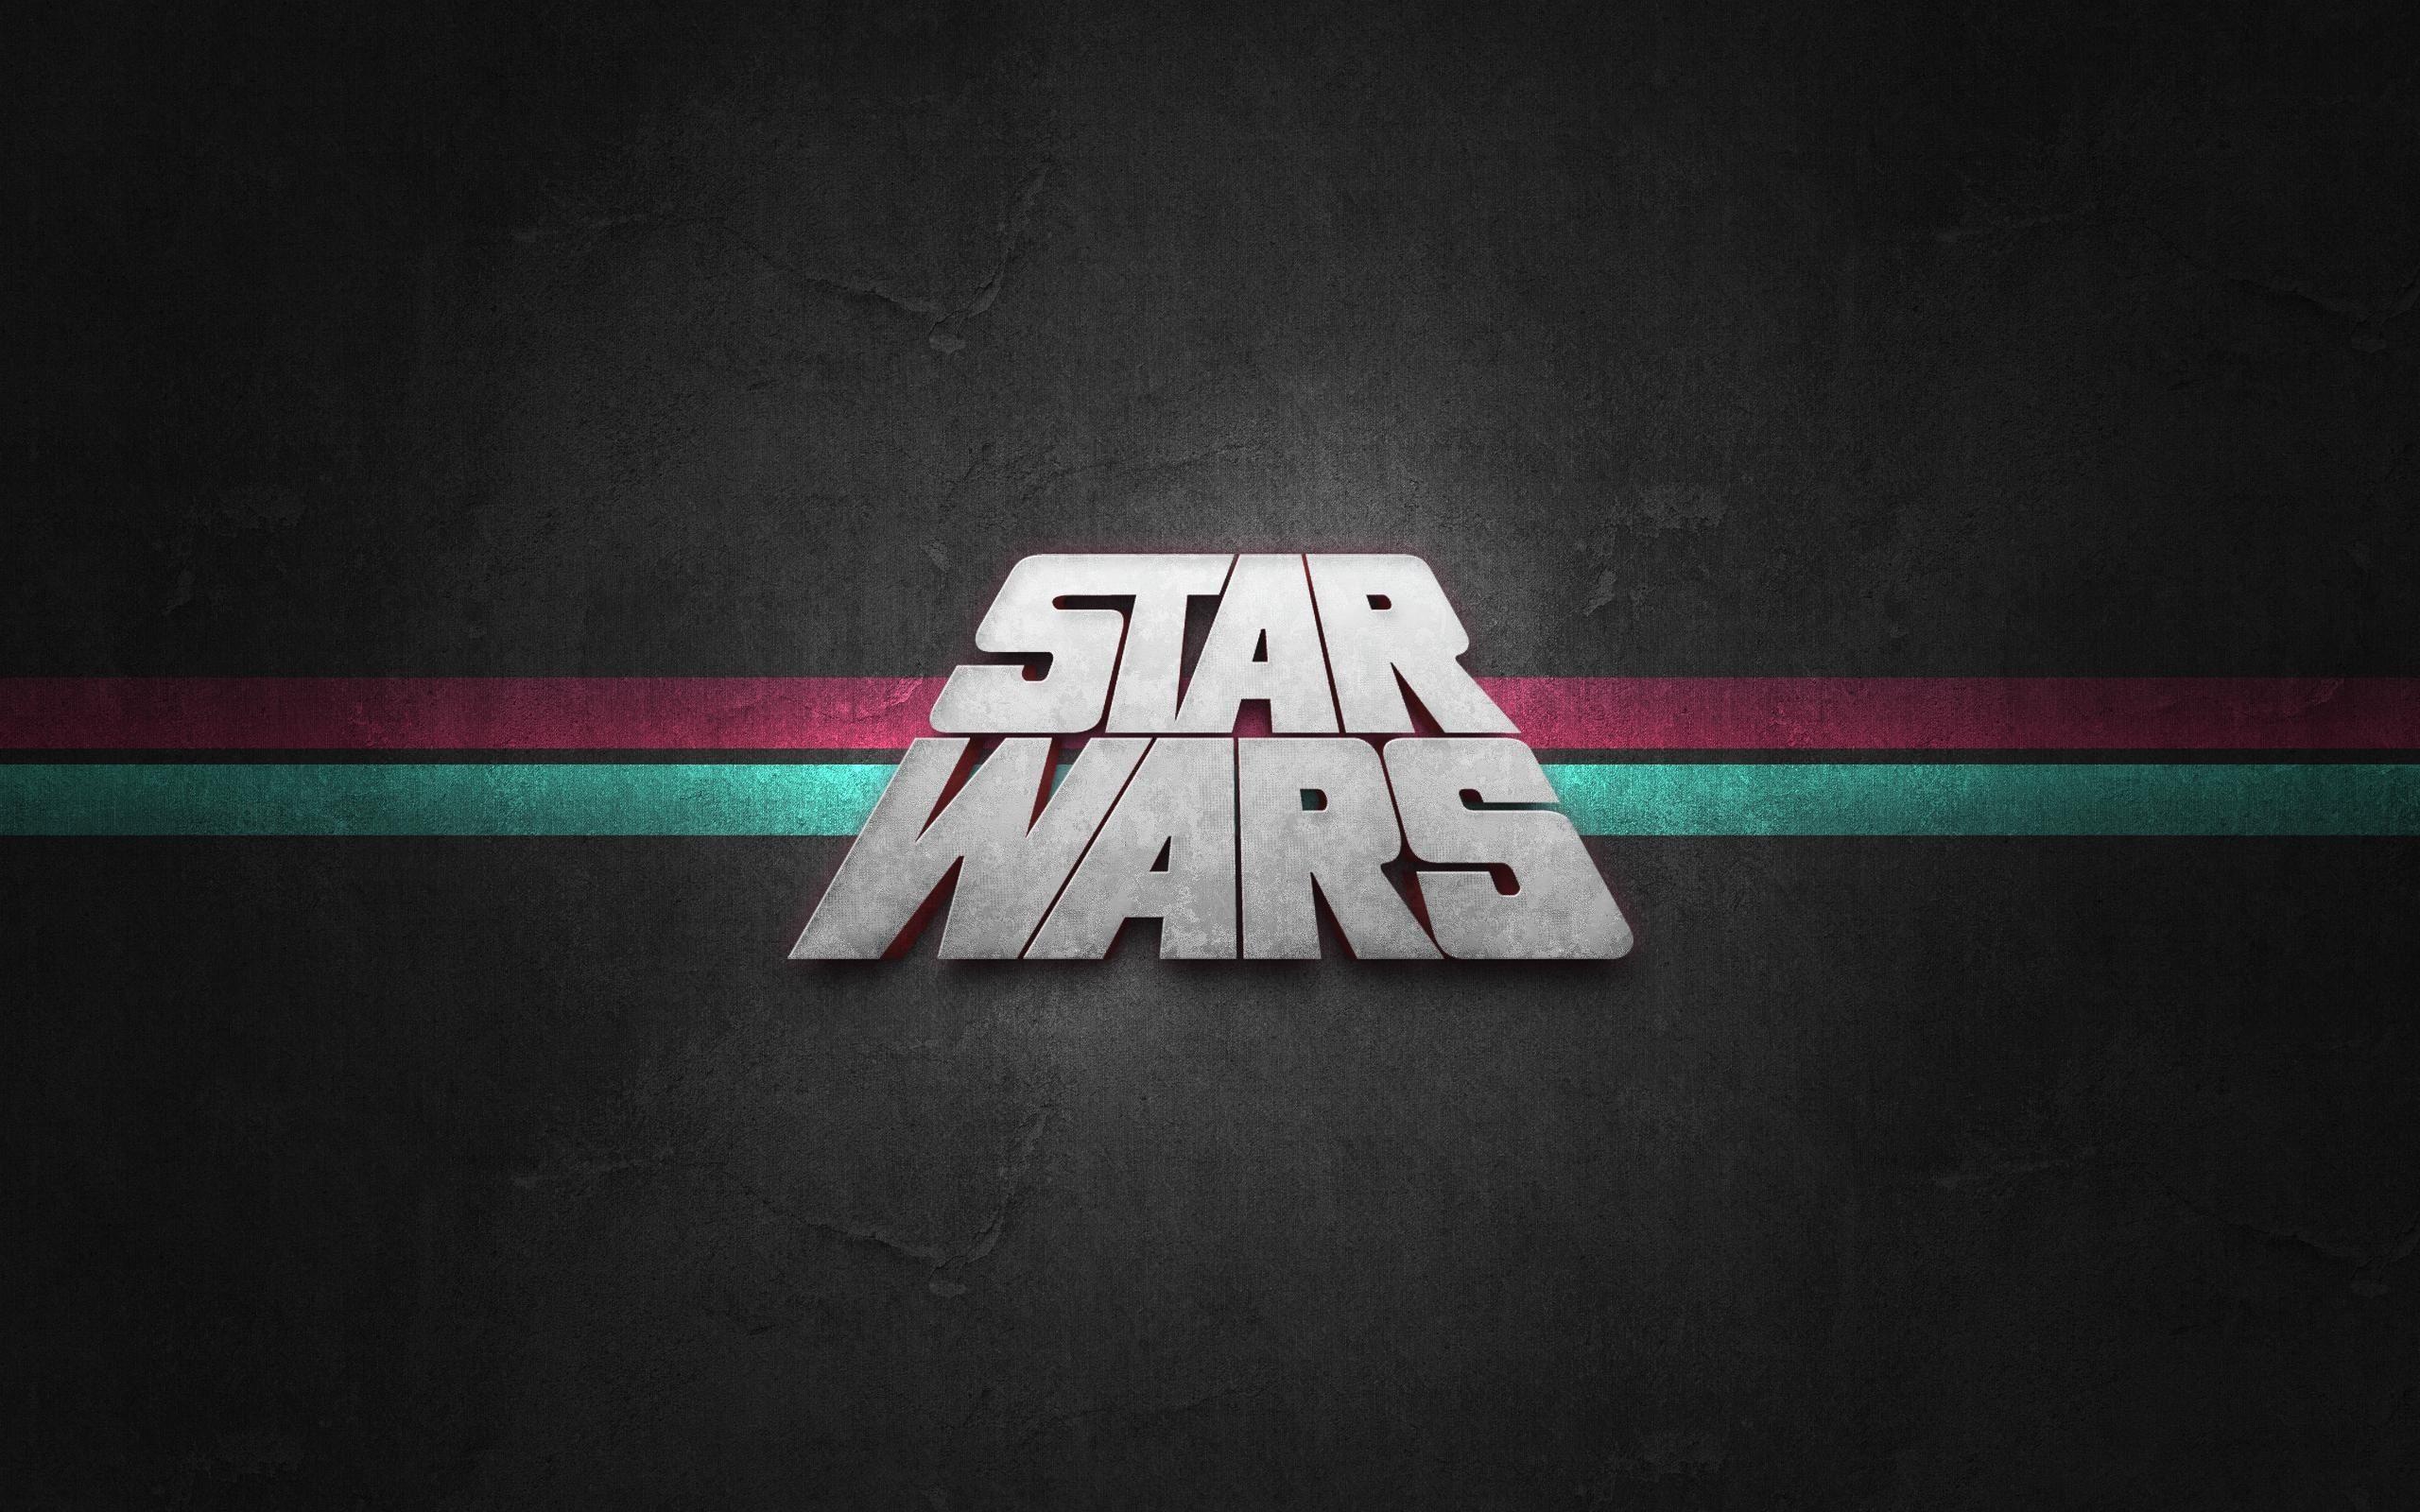 Star Wars Logo Wallpapers 2560x1600